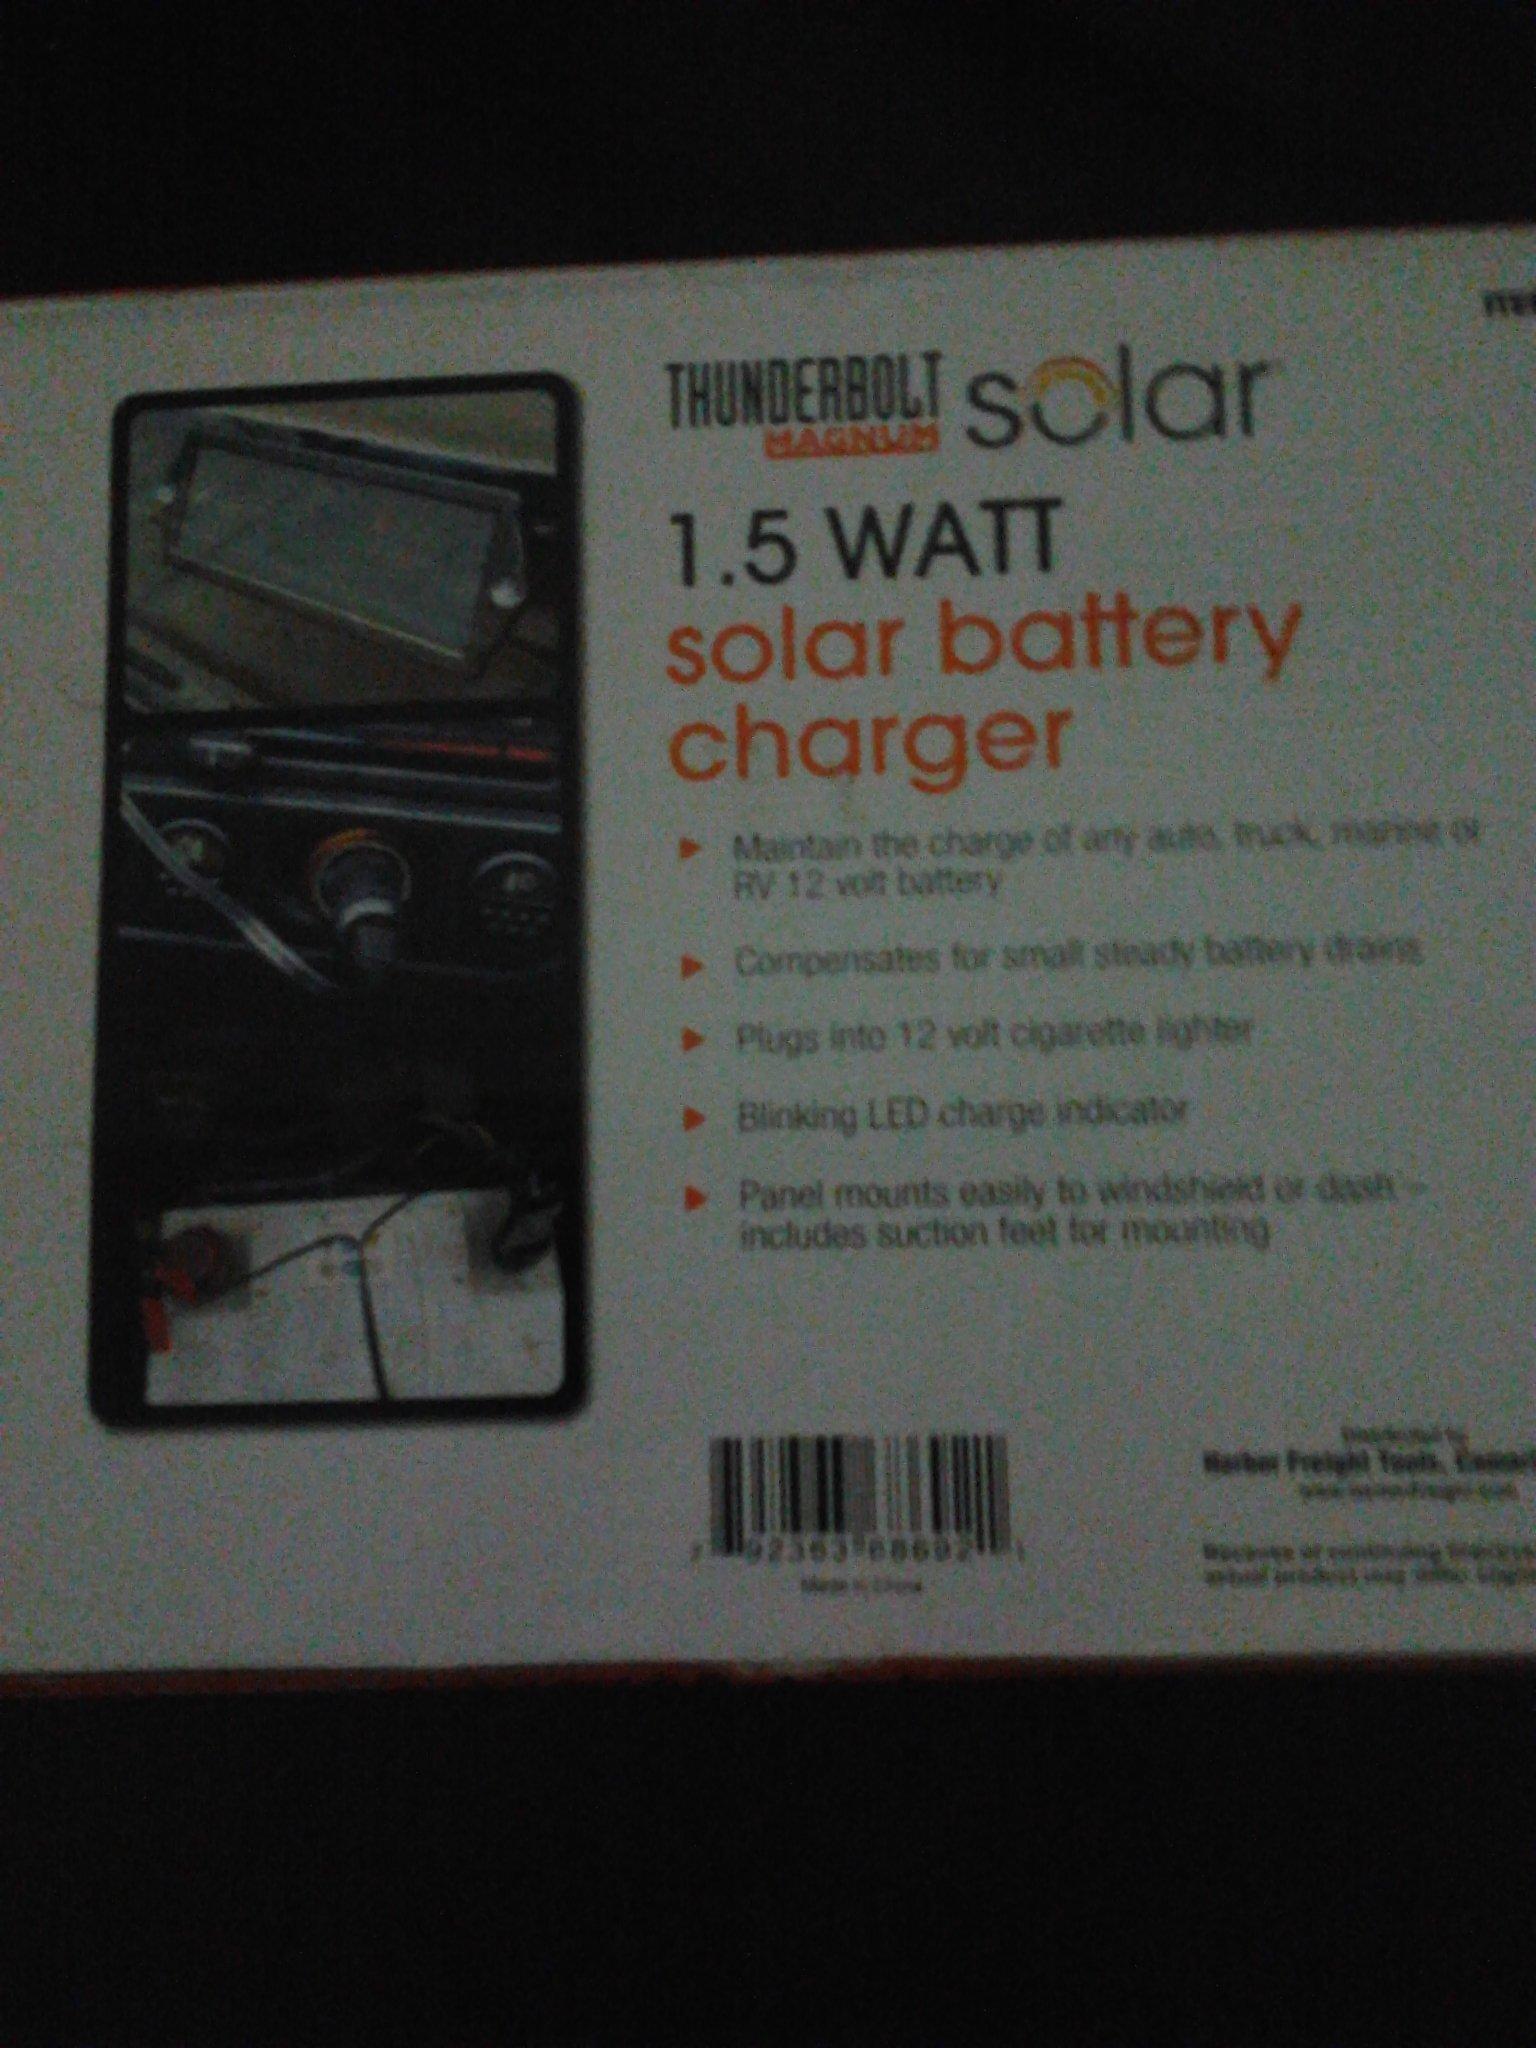 Thunderbolt Solar Battery Charger 1.5 Watt 12v Amorphous Crystal by Thunderbolt